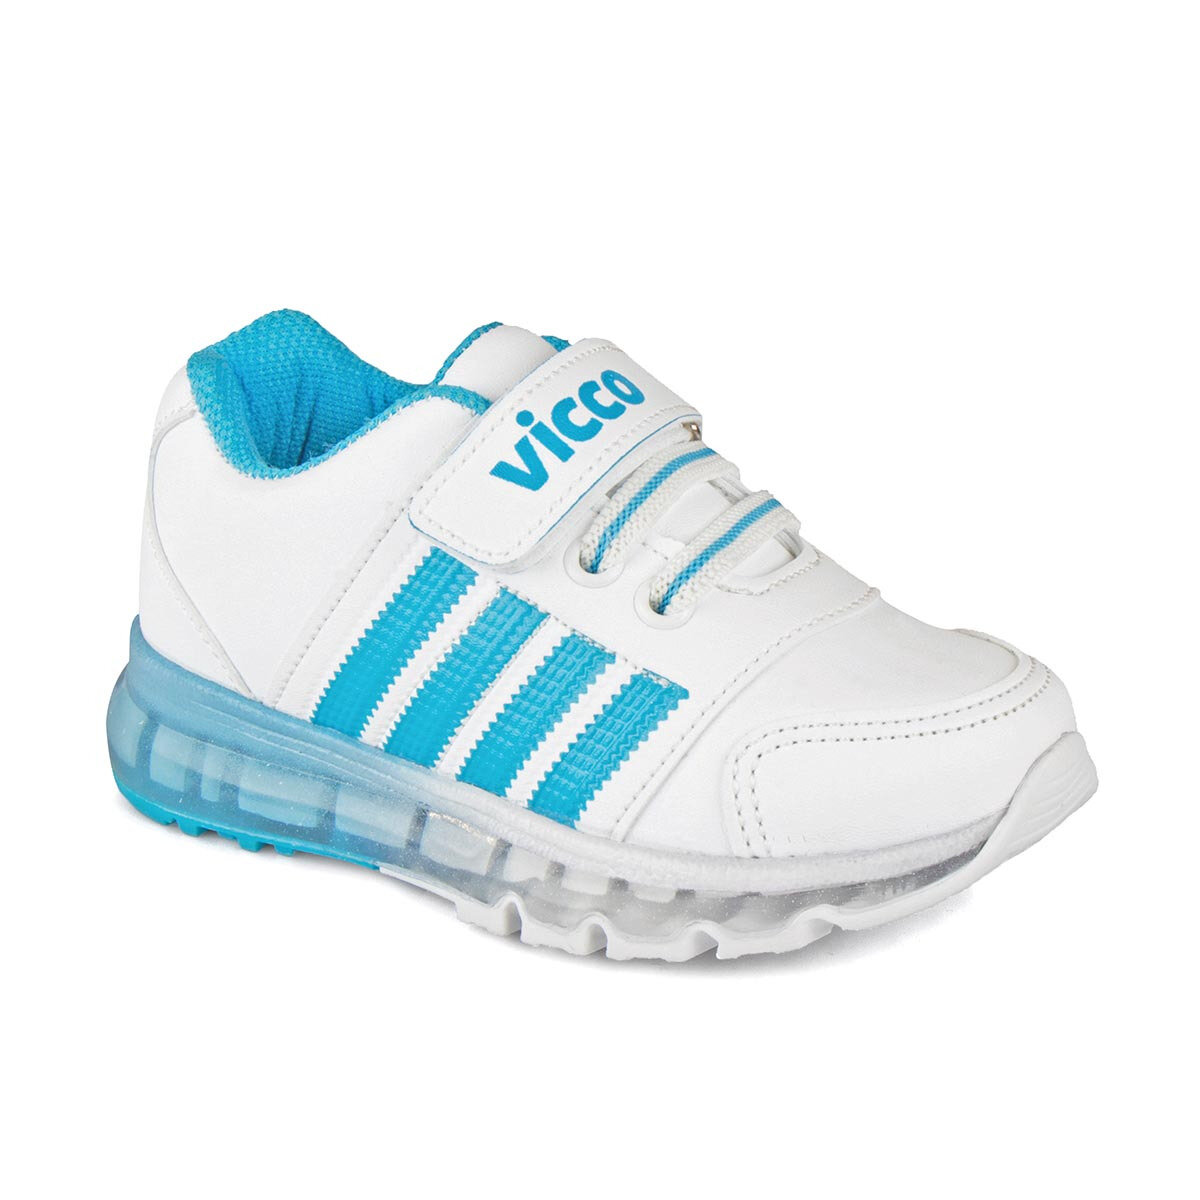 FLO 313. B19K. 138 White Male Child Sneaker Shoes VICCO